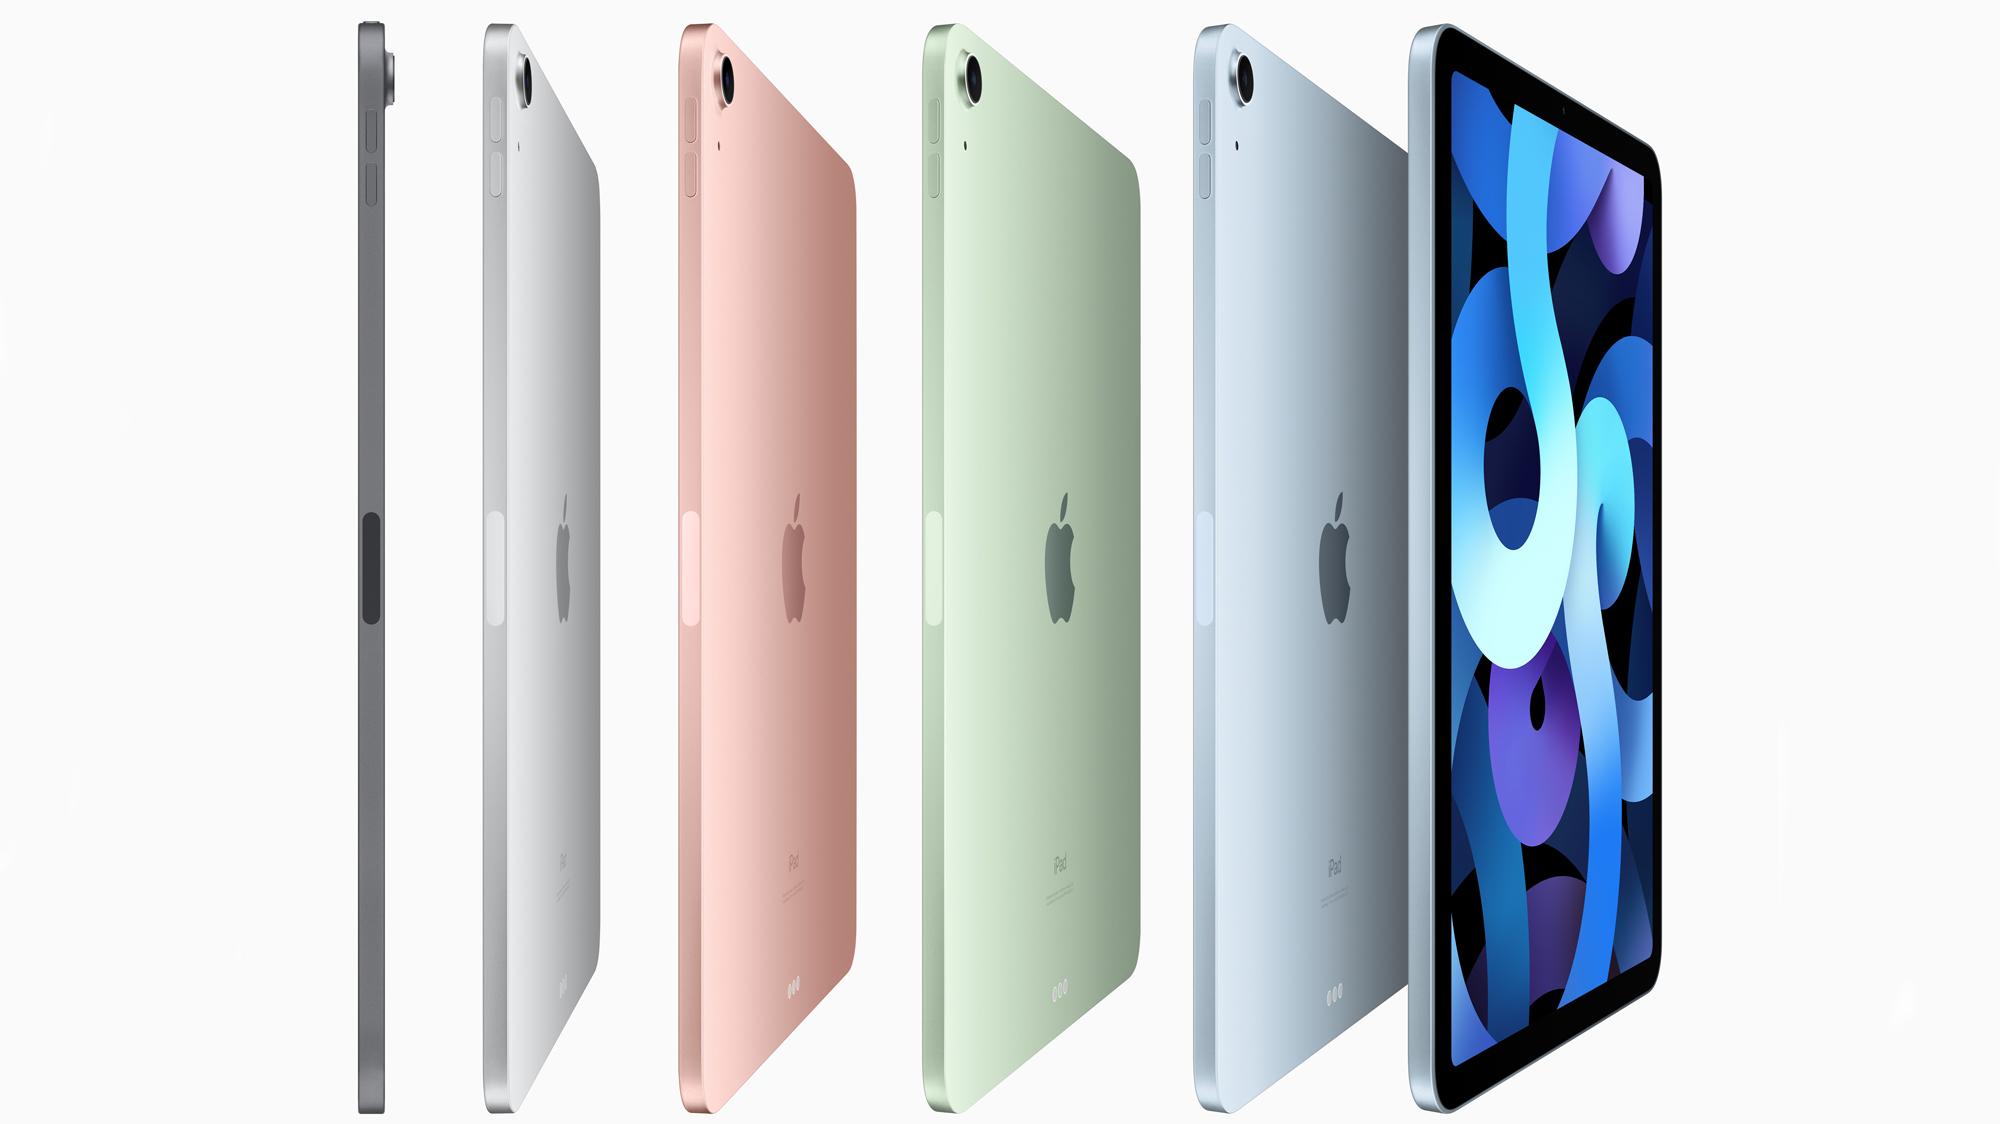 Yeni iPad Air ülkemizde kaç para? - Pembe Teknoloji